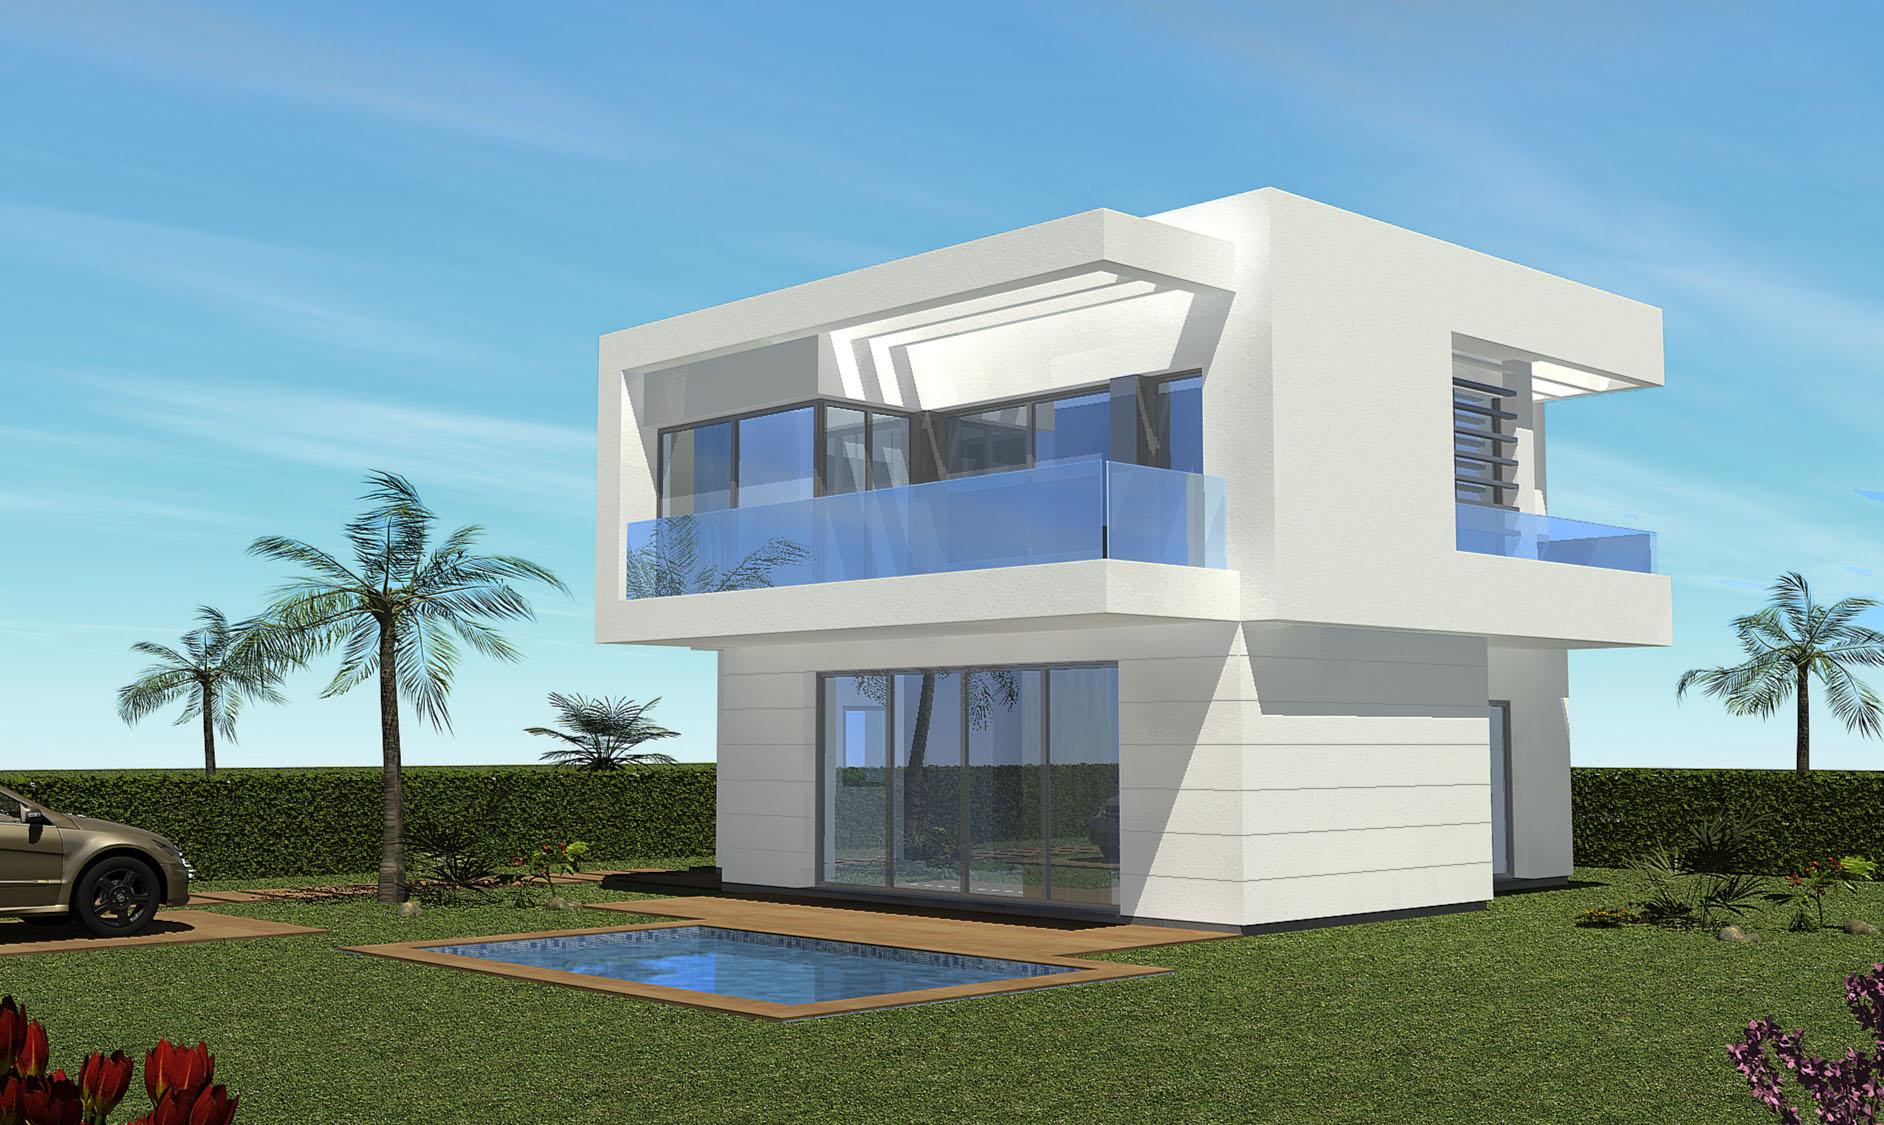 Villas 4 fa ades dans un golf s curis immo espagne - Superbe residence privee house in rubi en espagne ...